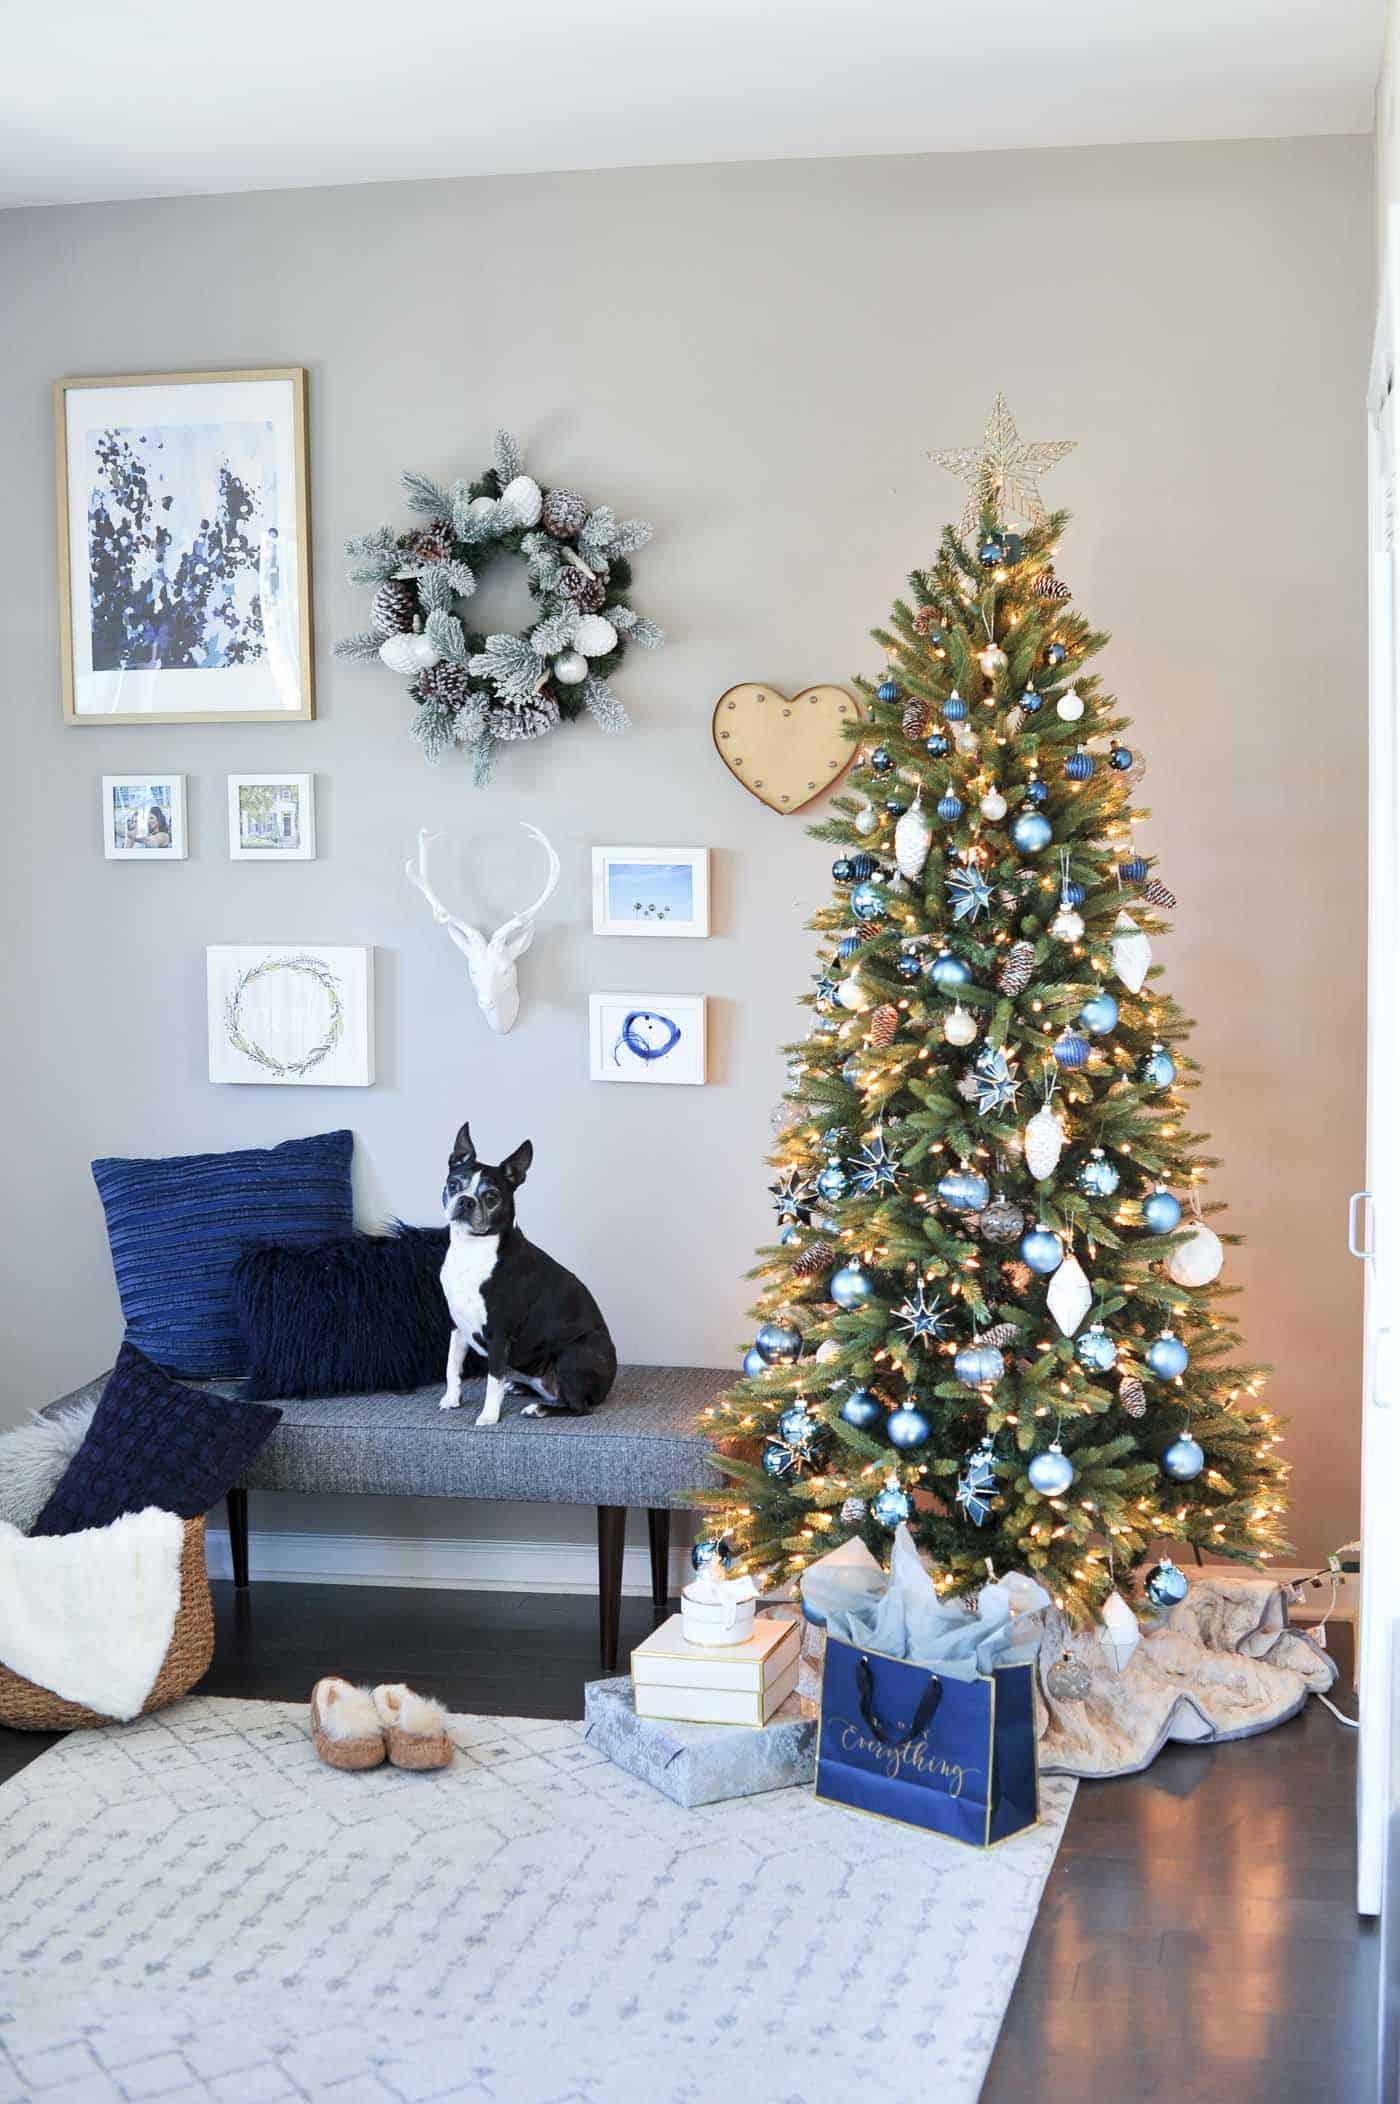 monochromatic christmas tree ideas blue christmas decor ideas \u2013 My Style Vita @mystylevita-8 & monochromatic christmas tree ideas blue christmas decor ideas - My ...